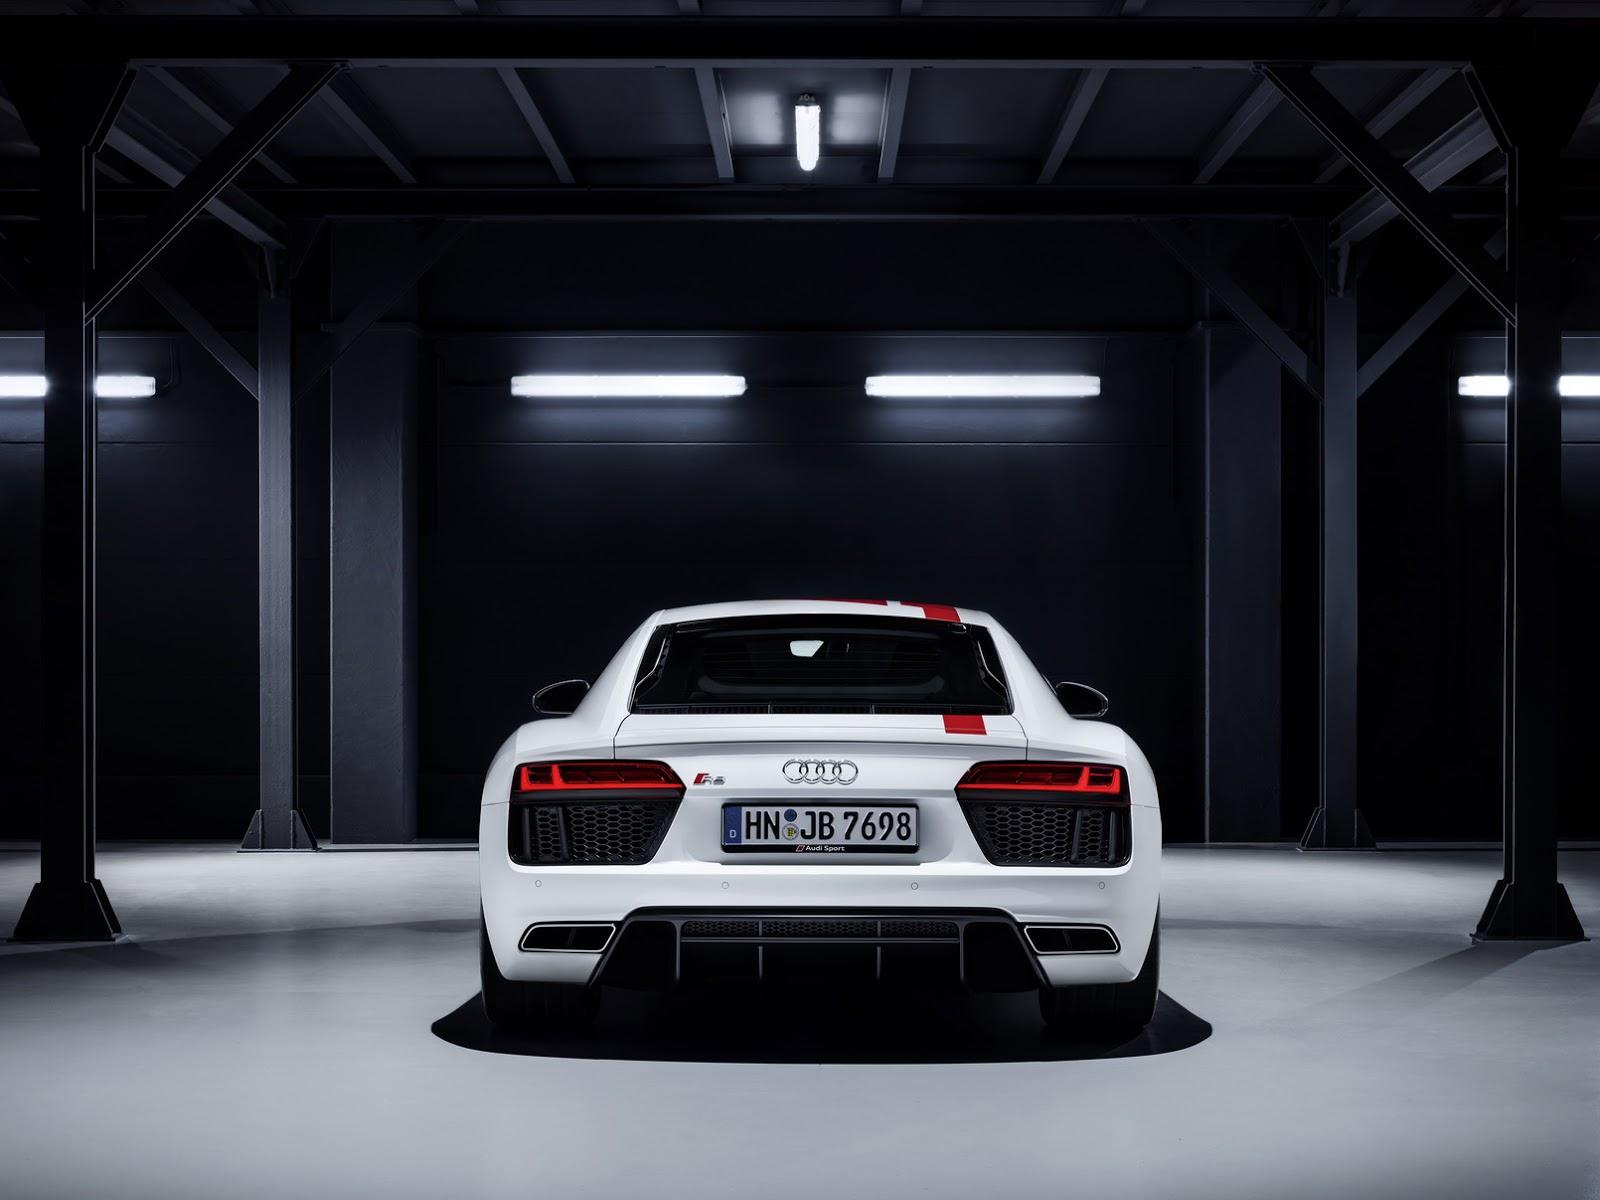 2018_Audi_R8_V10_RWS_45